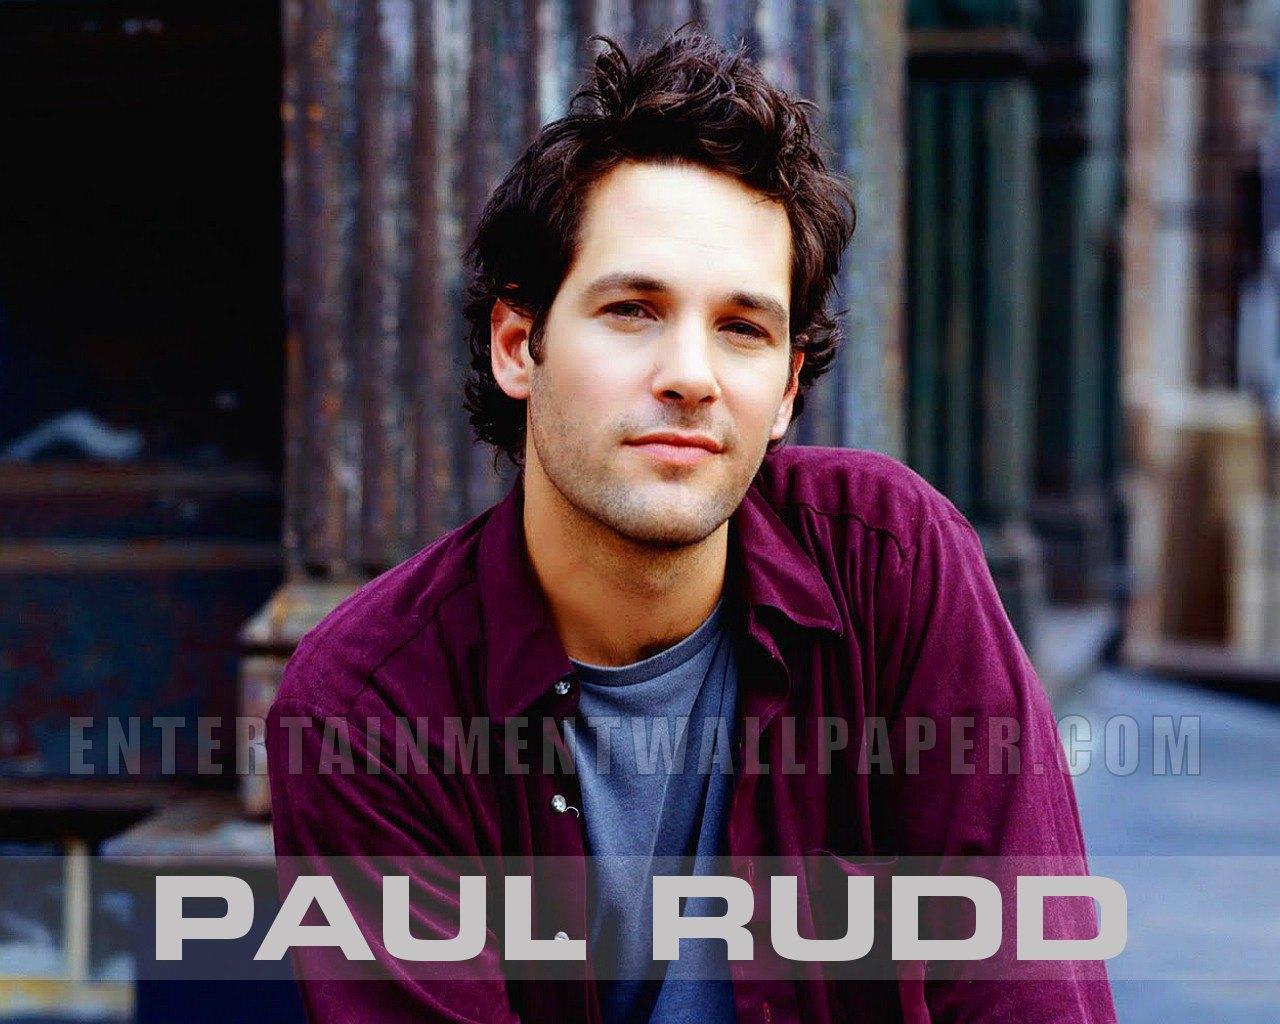 PAUL RUDD WALLPAPER